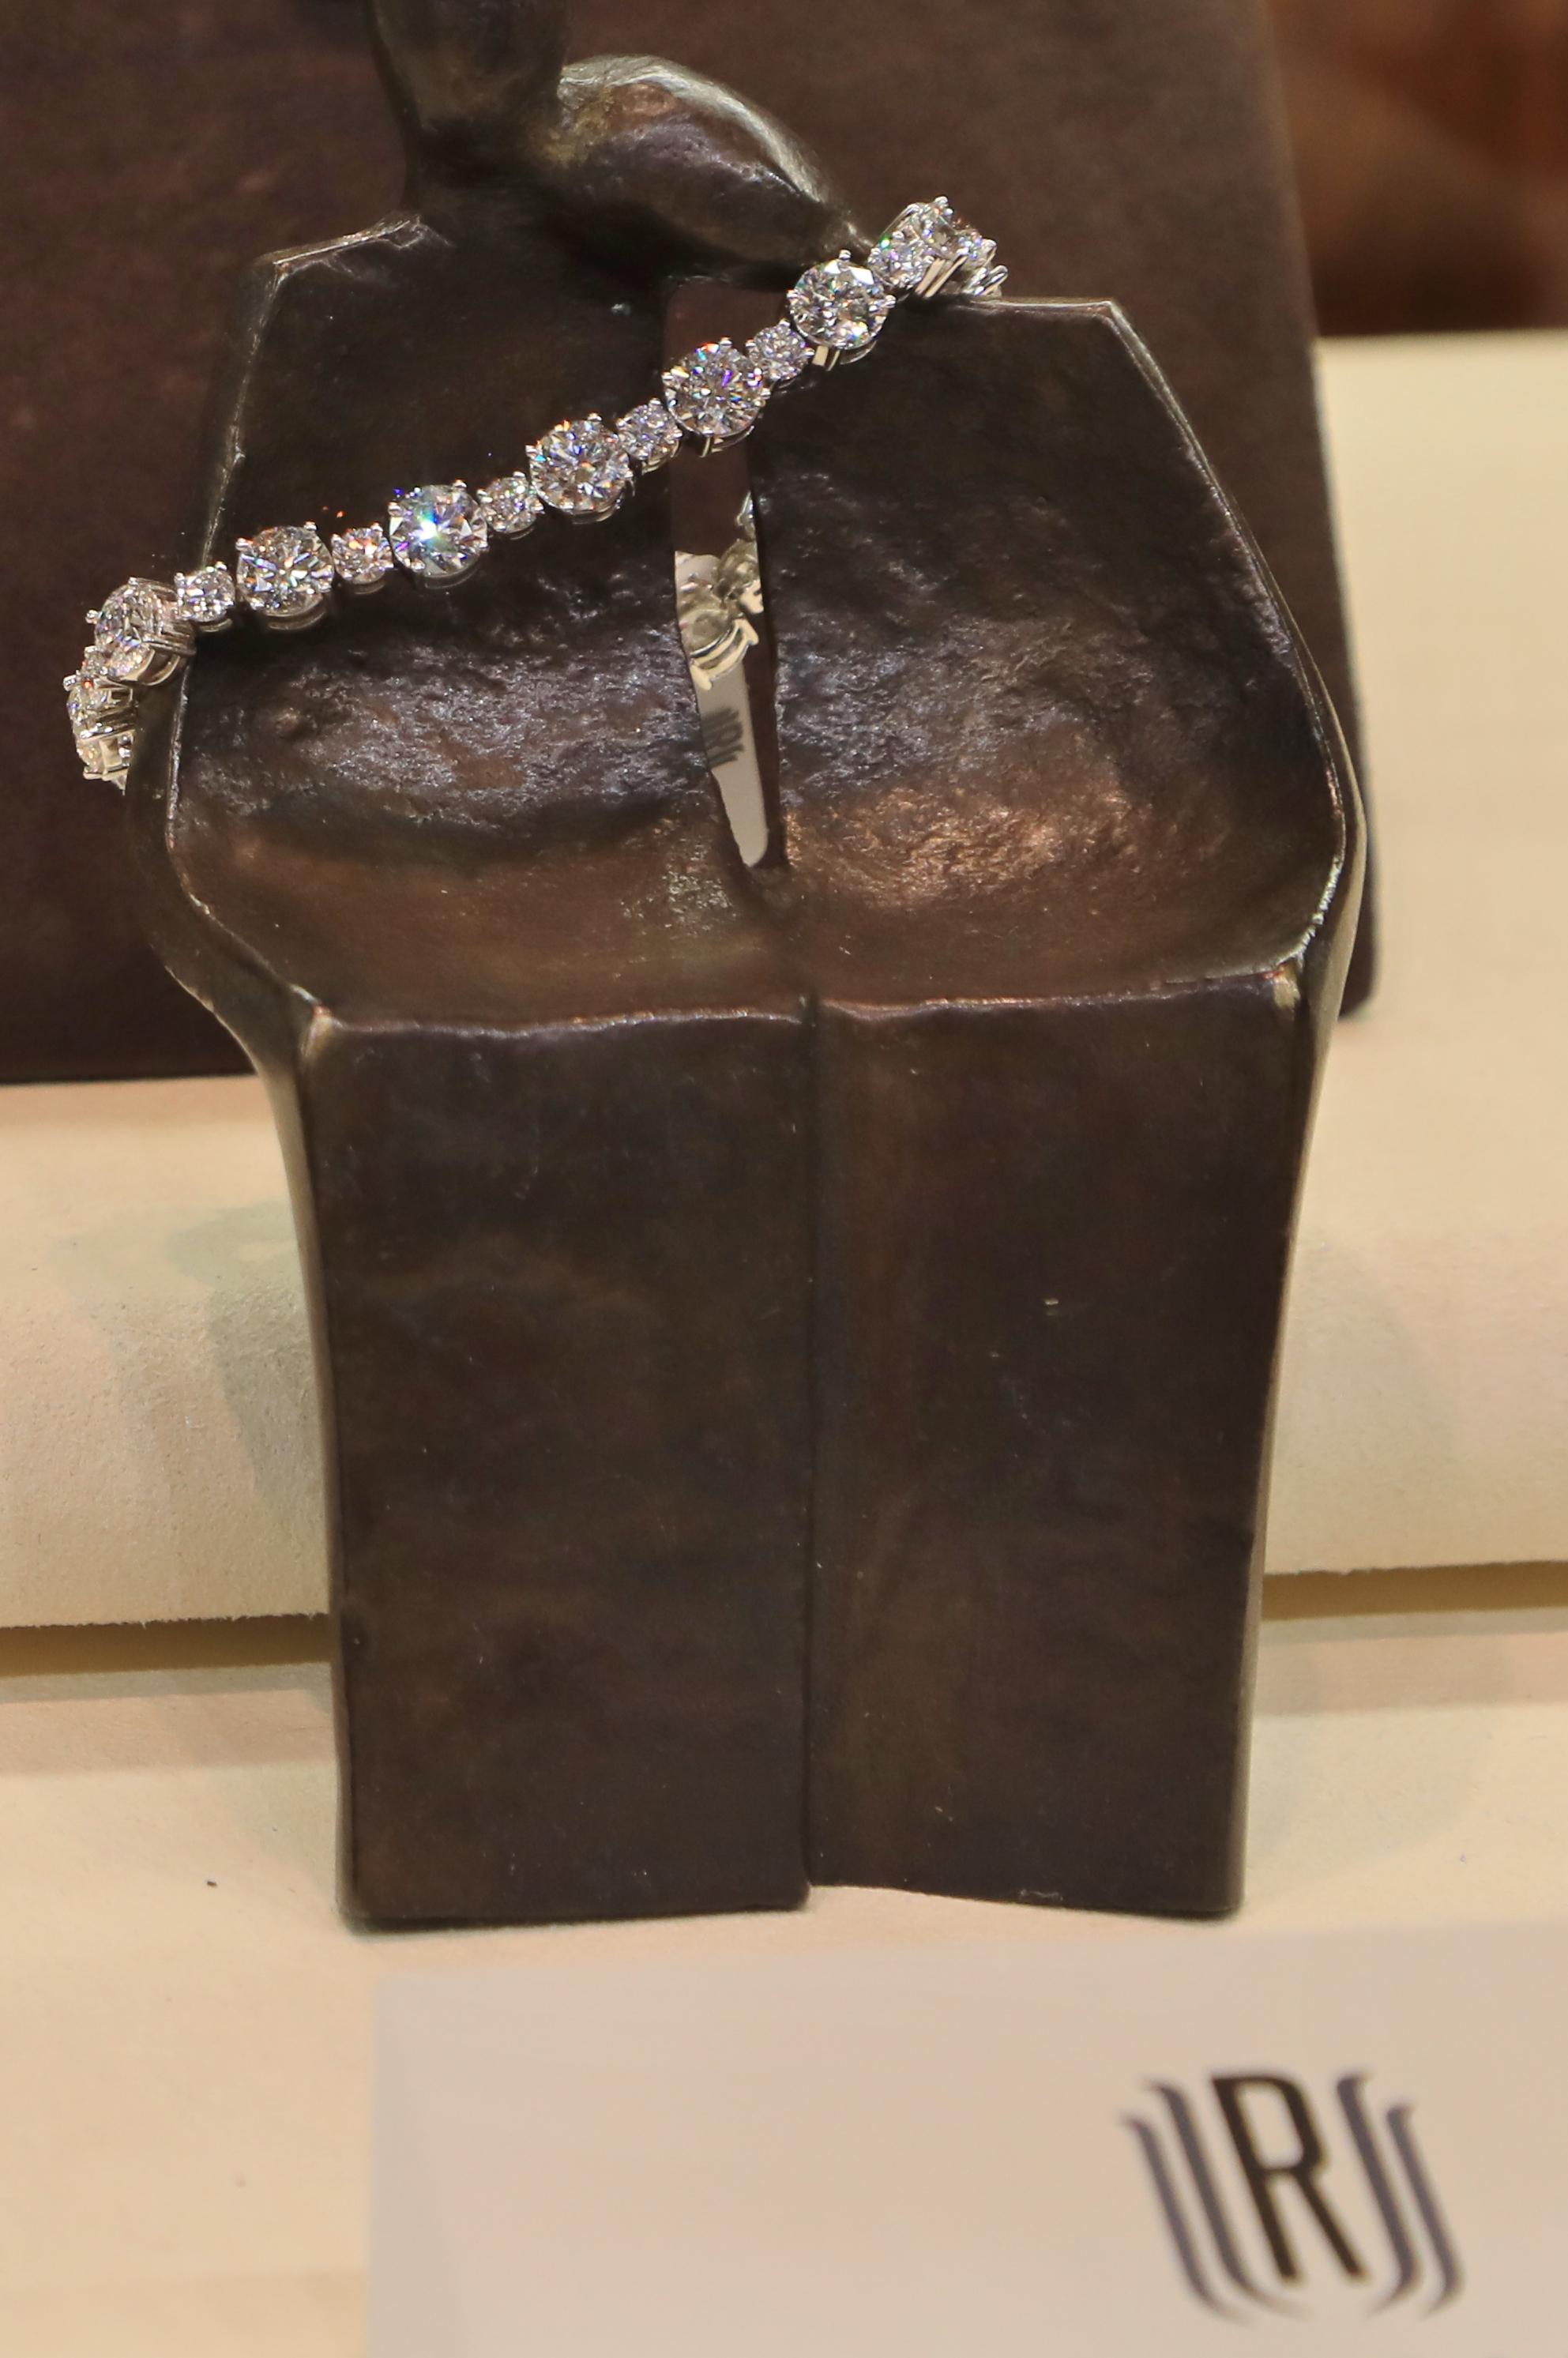 2018 Simon Jewelers Humane Society 017.JPG